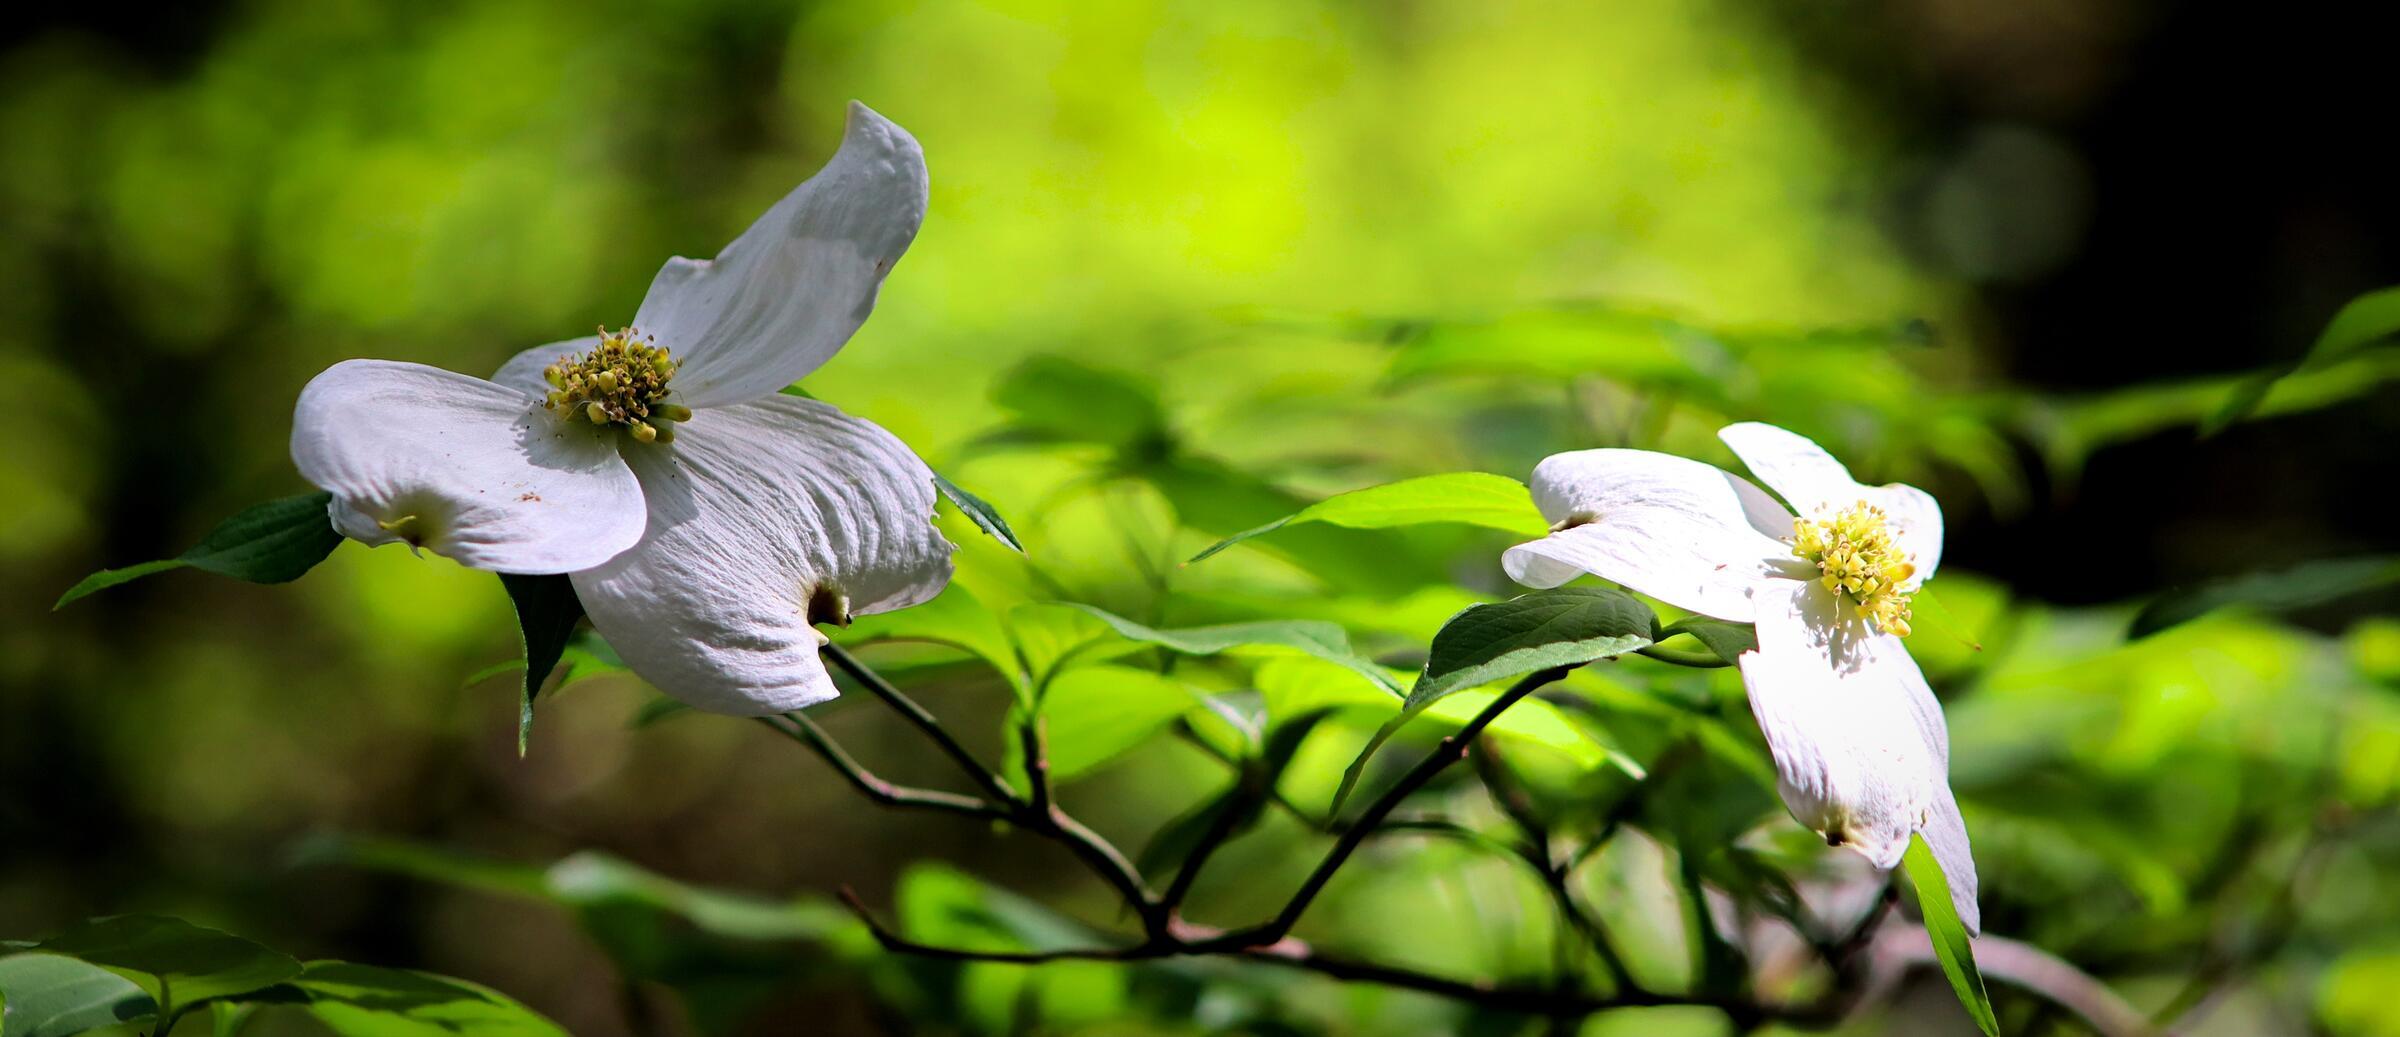 Photo of blooms from the Flowering Dogwood tree (Cornus florida)